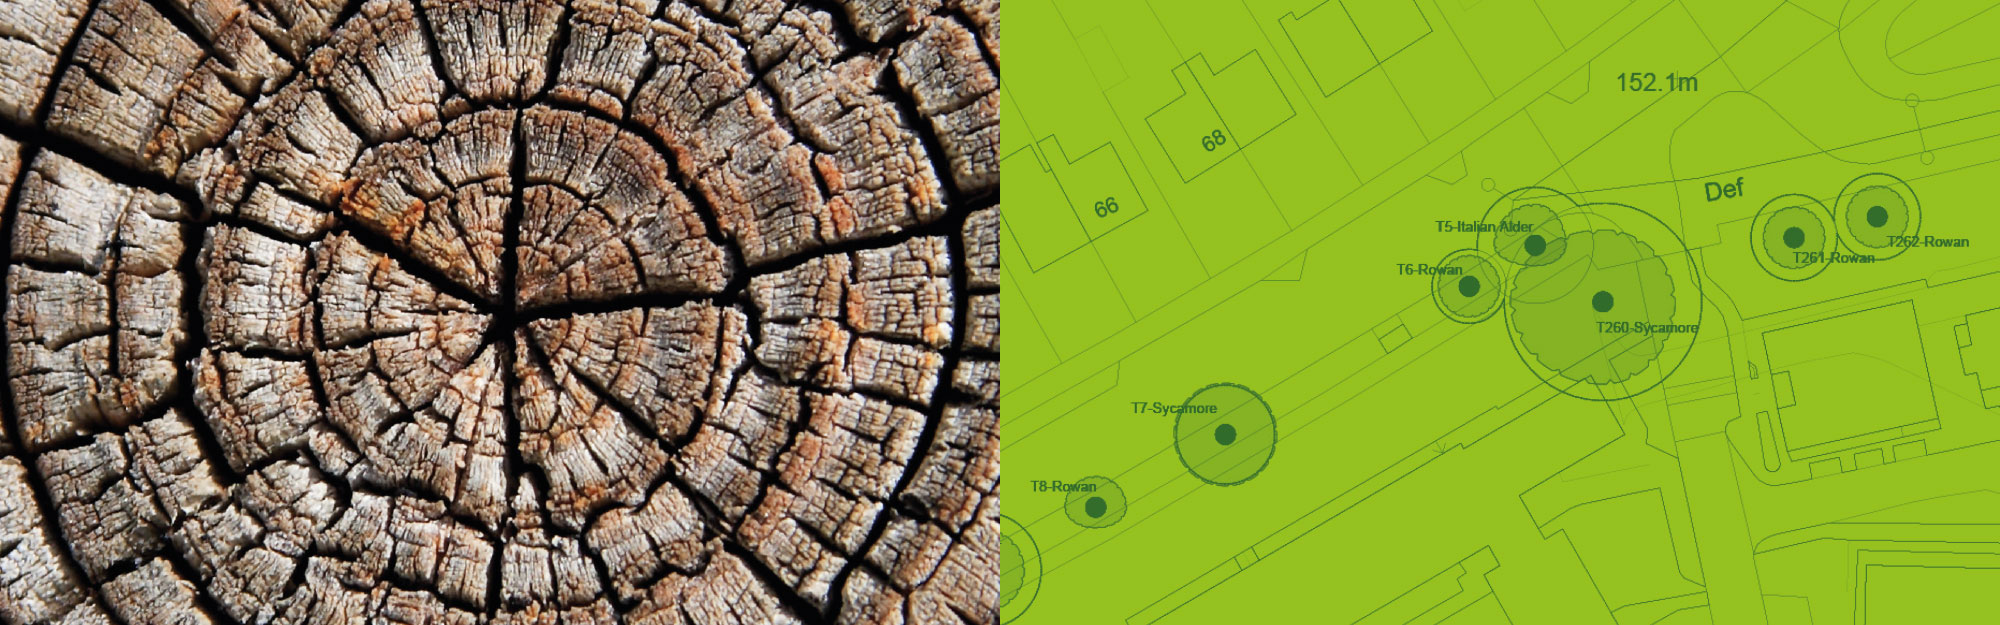 ArbTS Arboricultural Technician